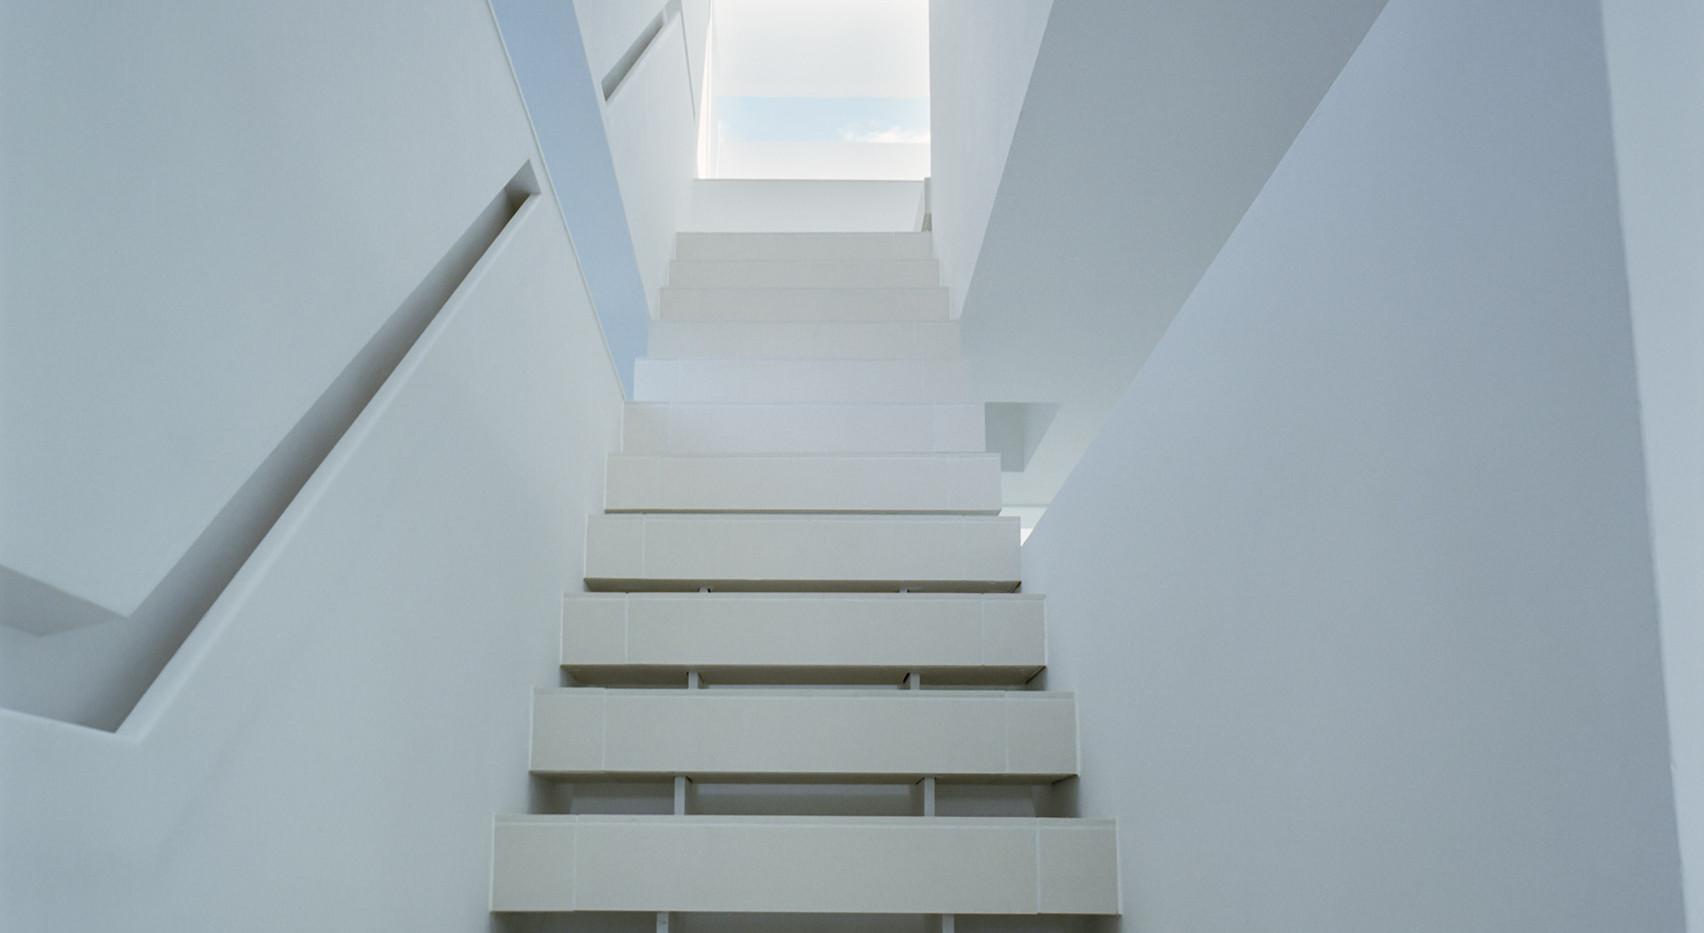 Stairway to Modern Heaven